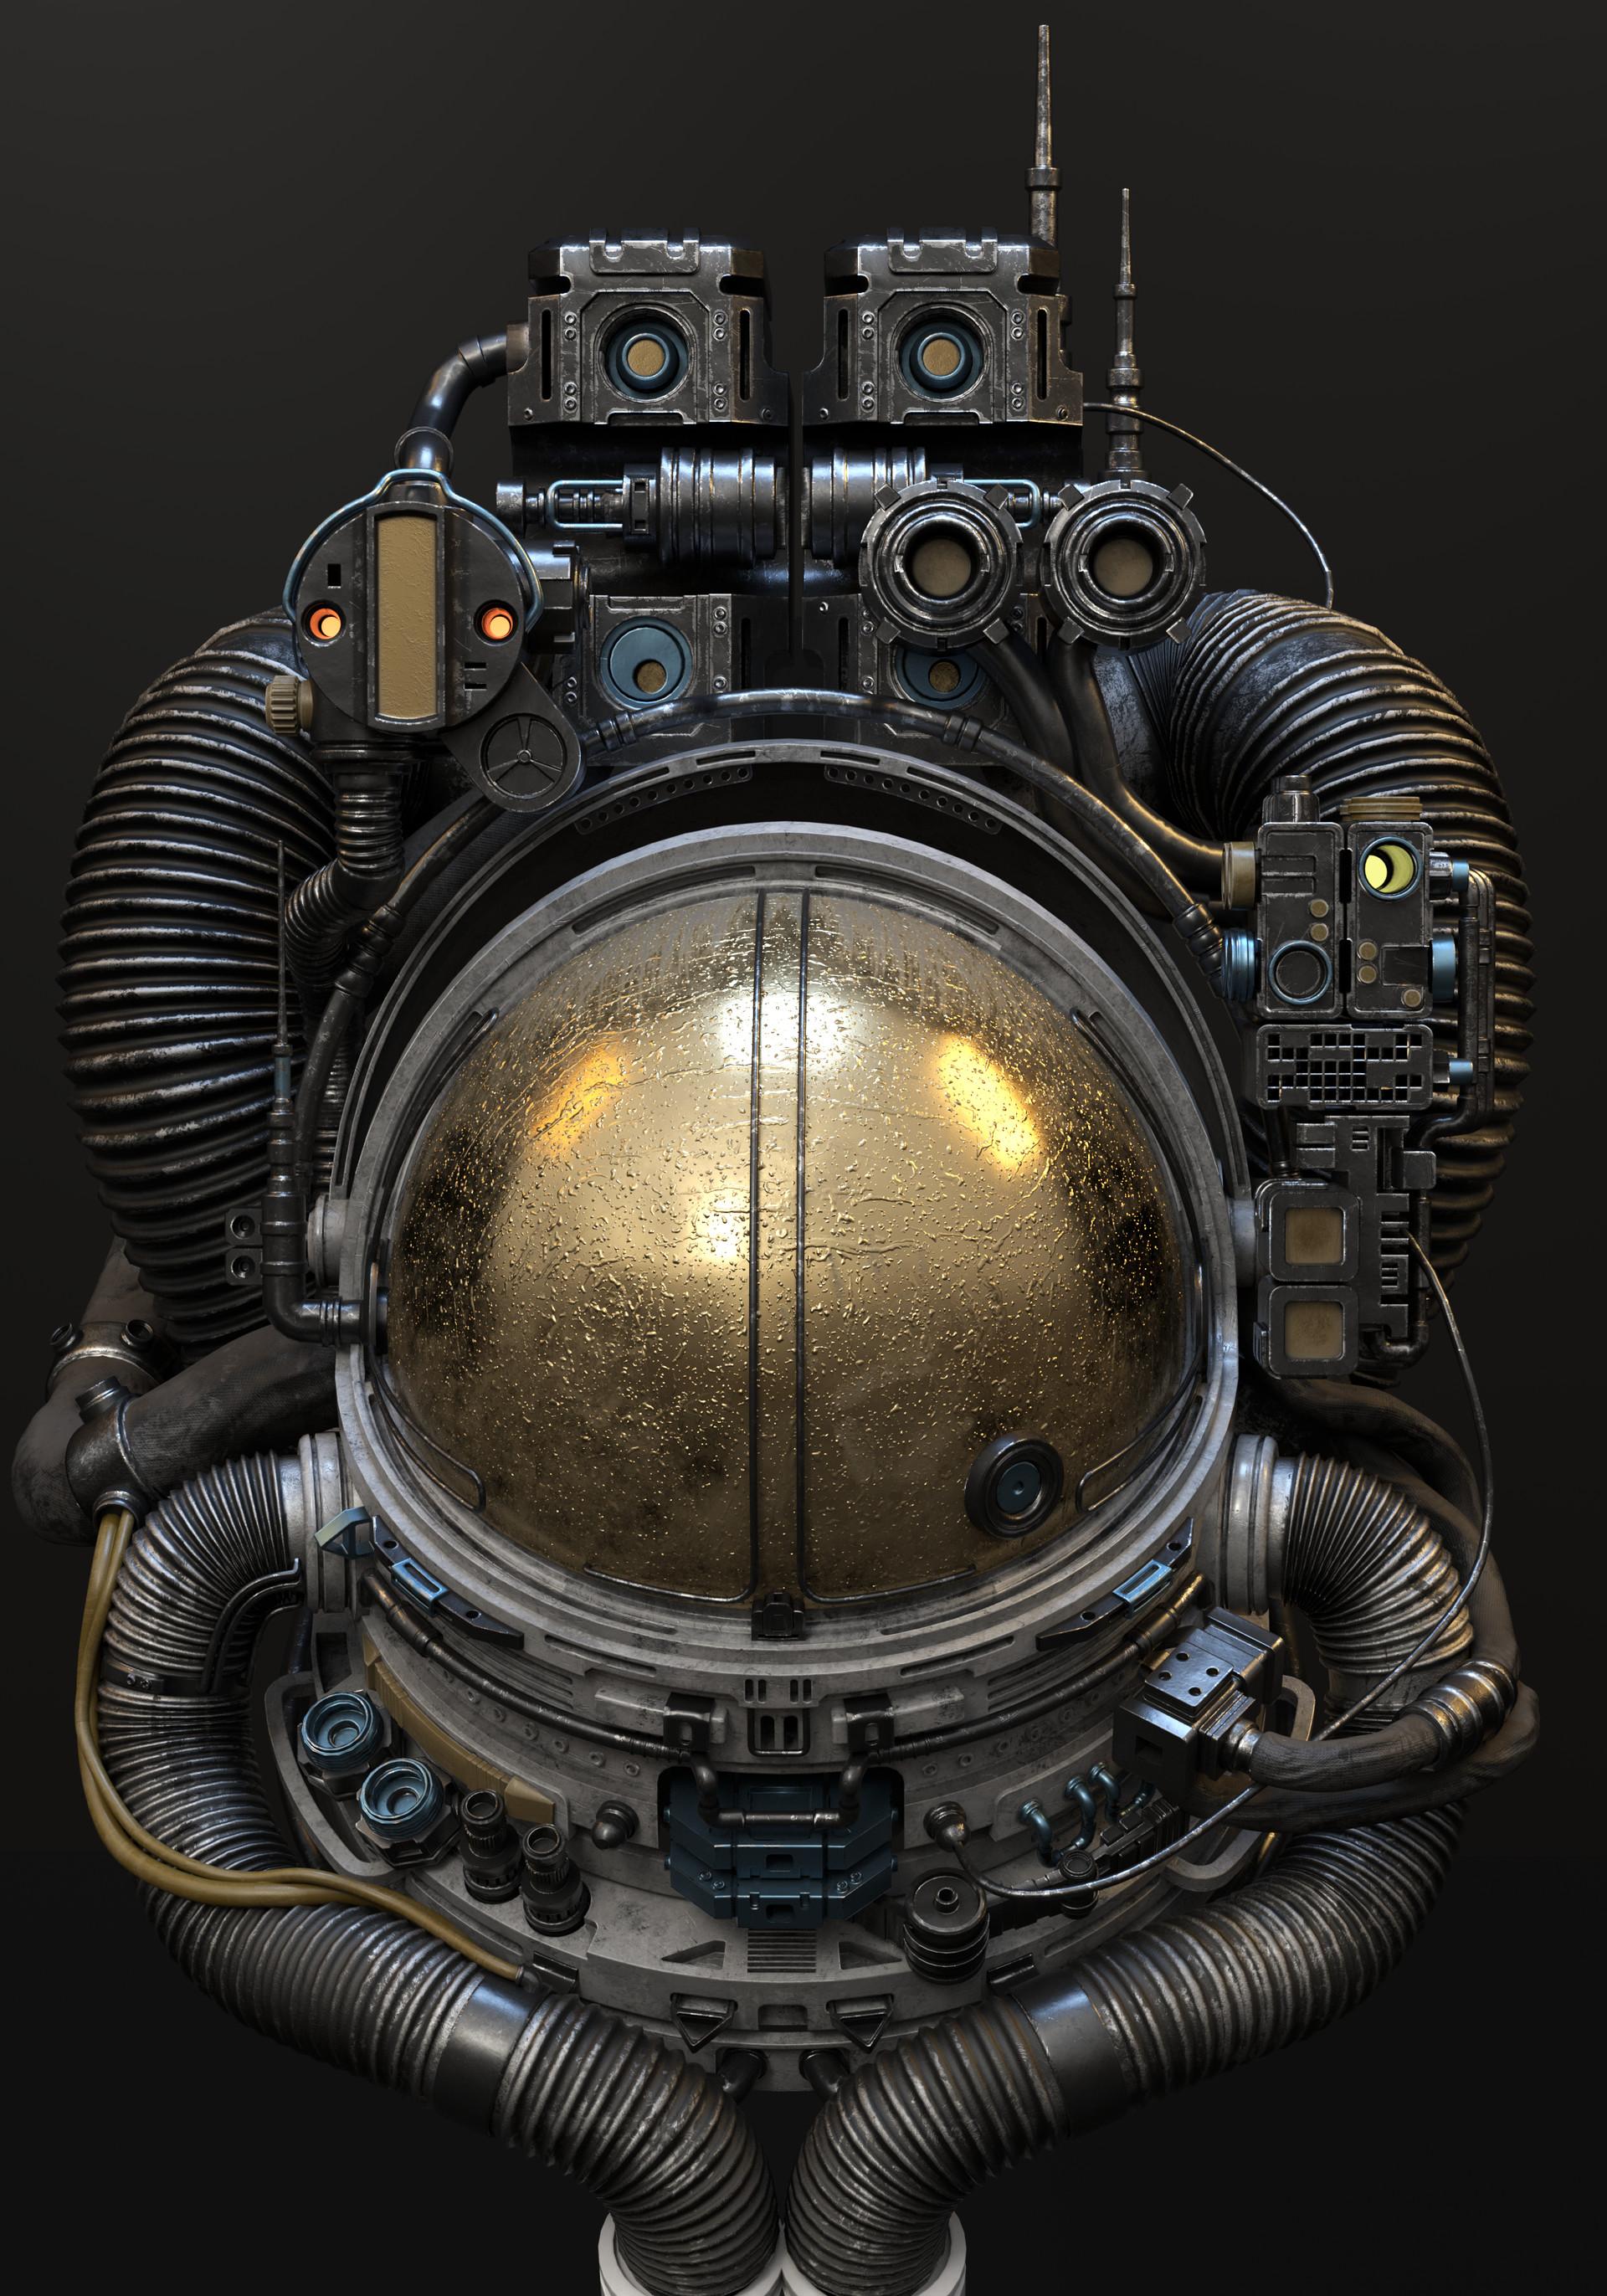 Antoni depowski astronaut clean